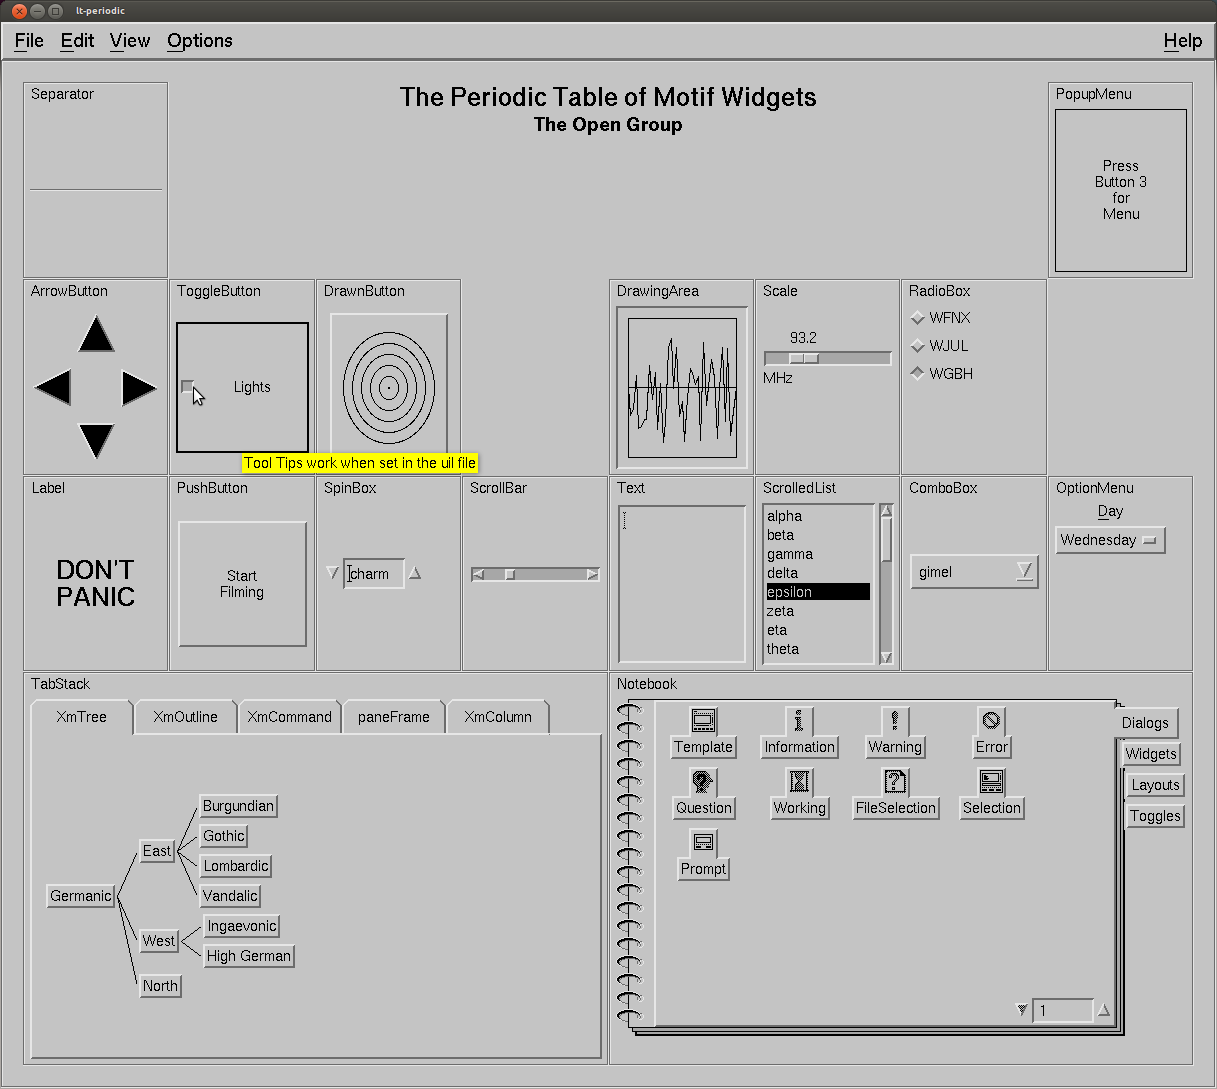 Sample of Motif widgets